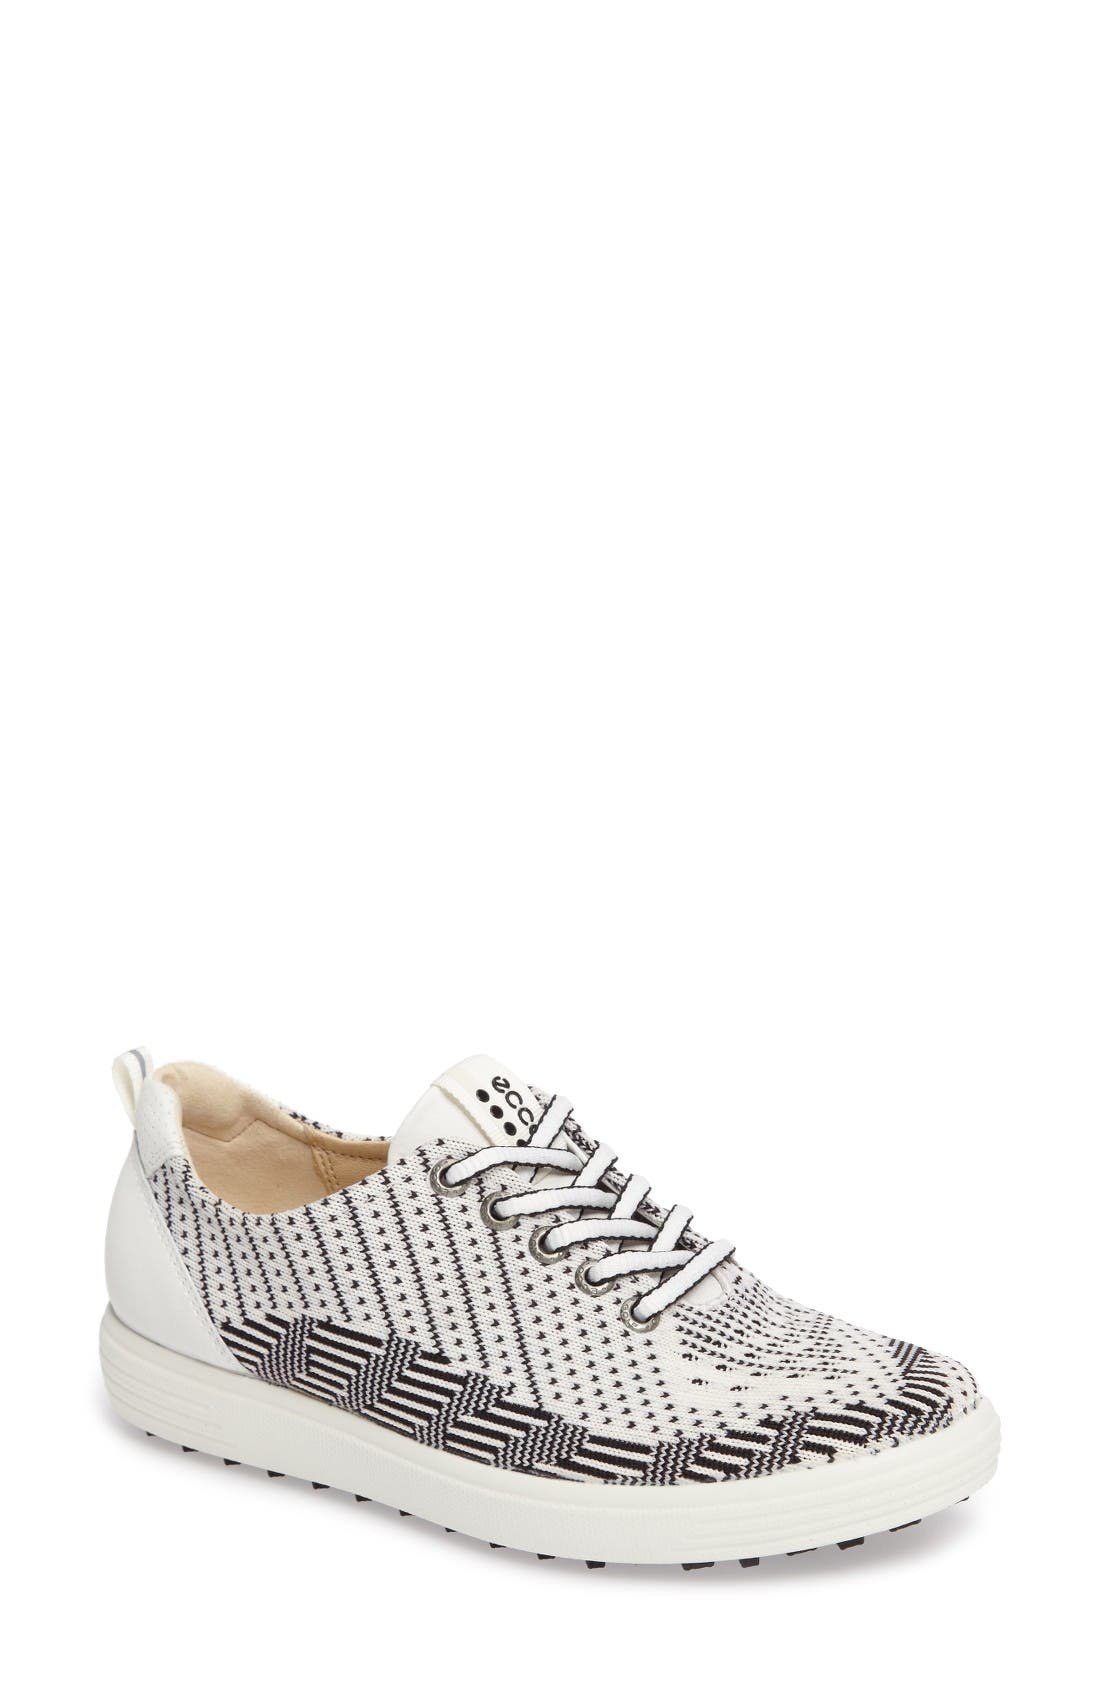 Casual Hybrid Knit Golf Sneaker,                             Main thumbnail 1, color,                             White/ Black/ White Leather